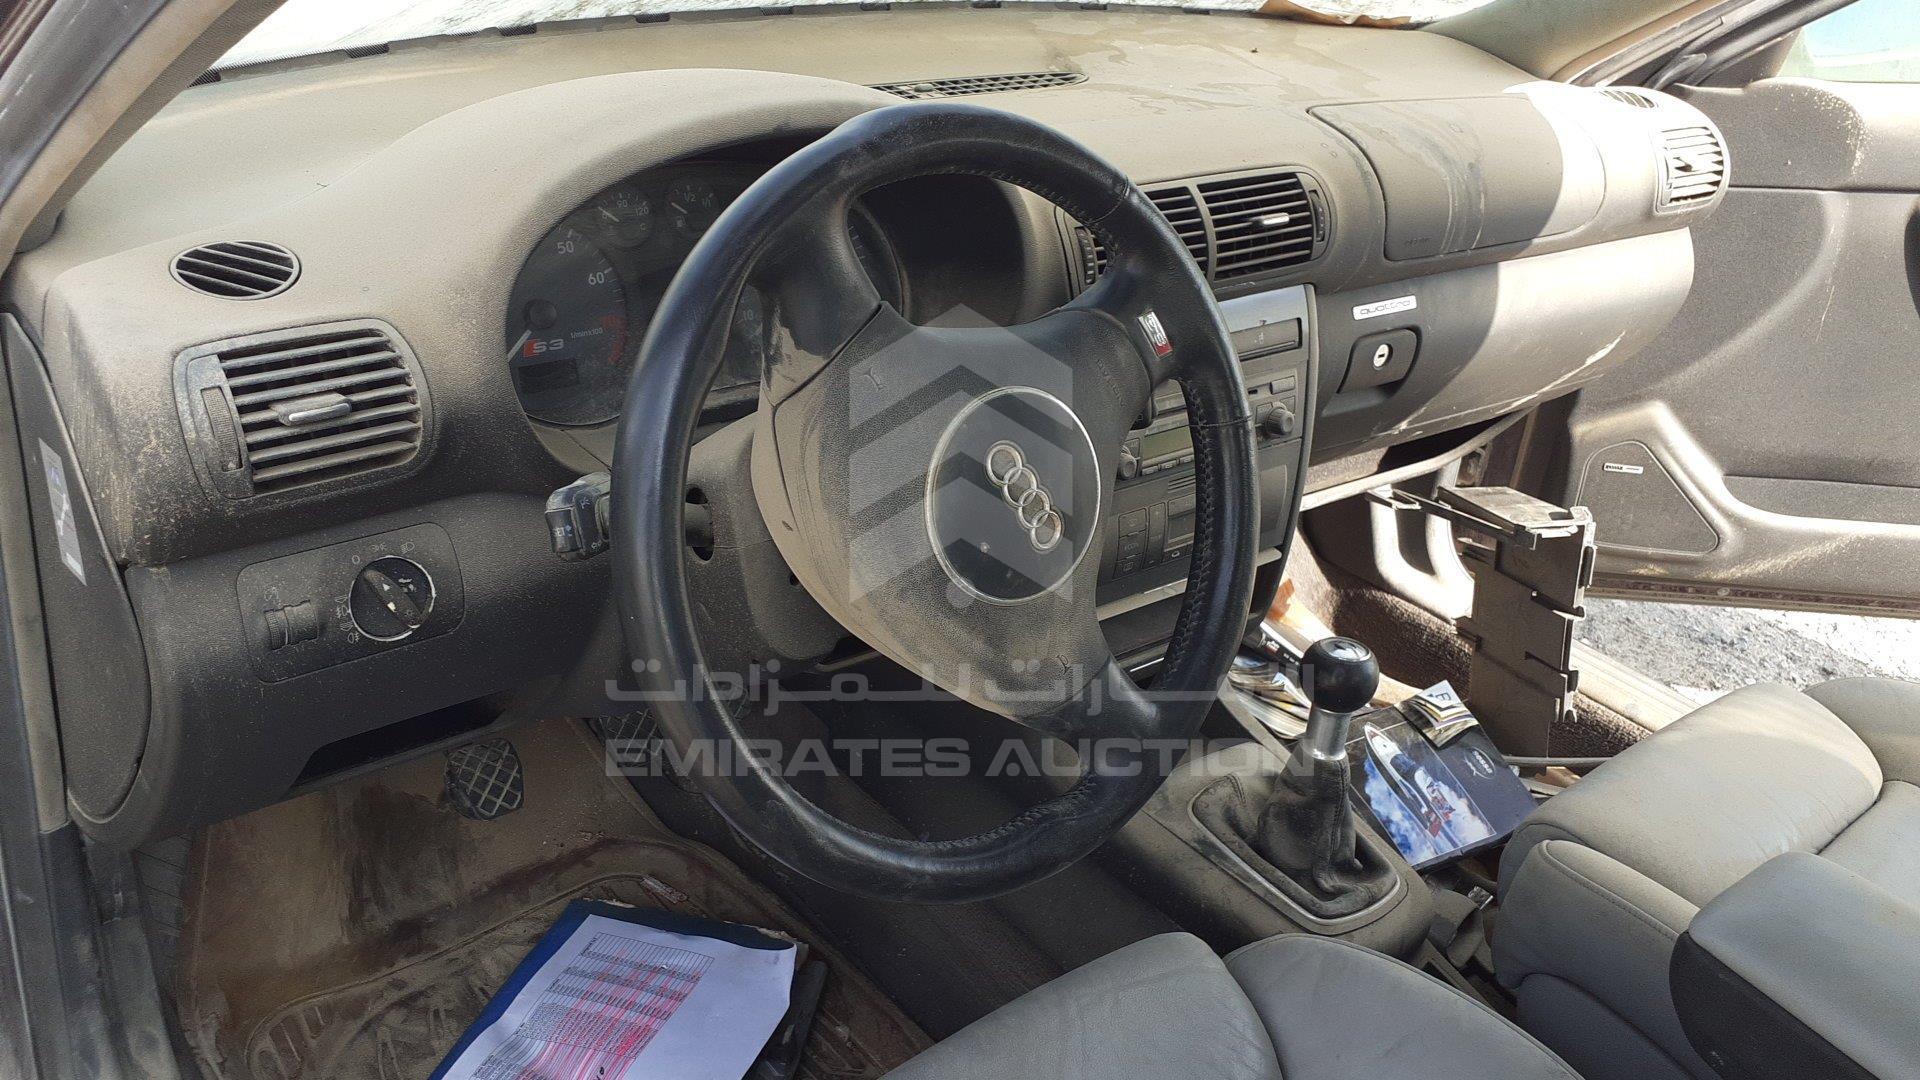 2002 Audi S3 for sale in UAE | 225863